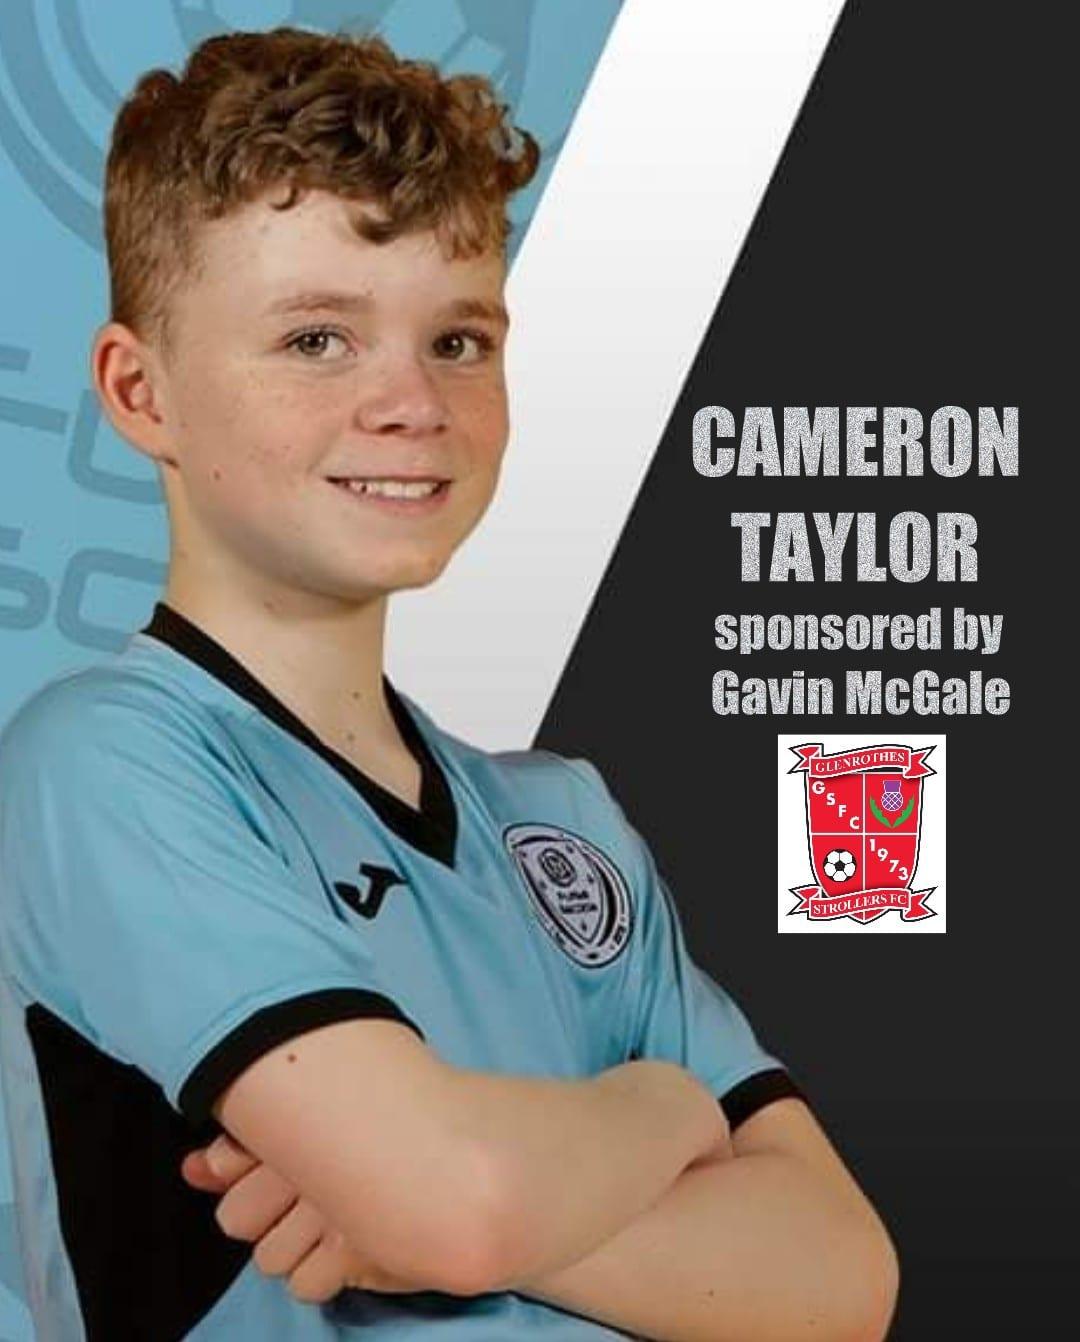 Cameron Taylor